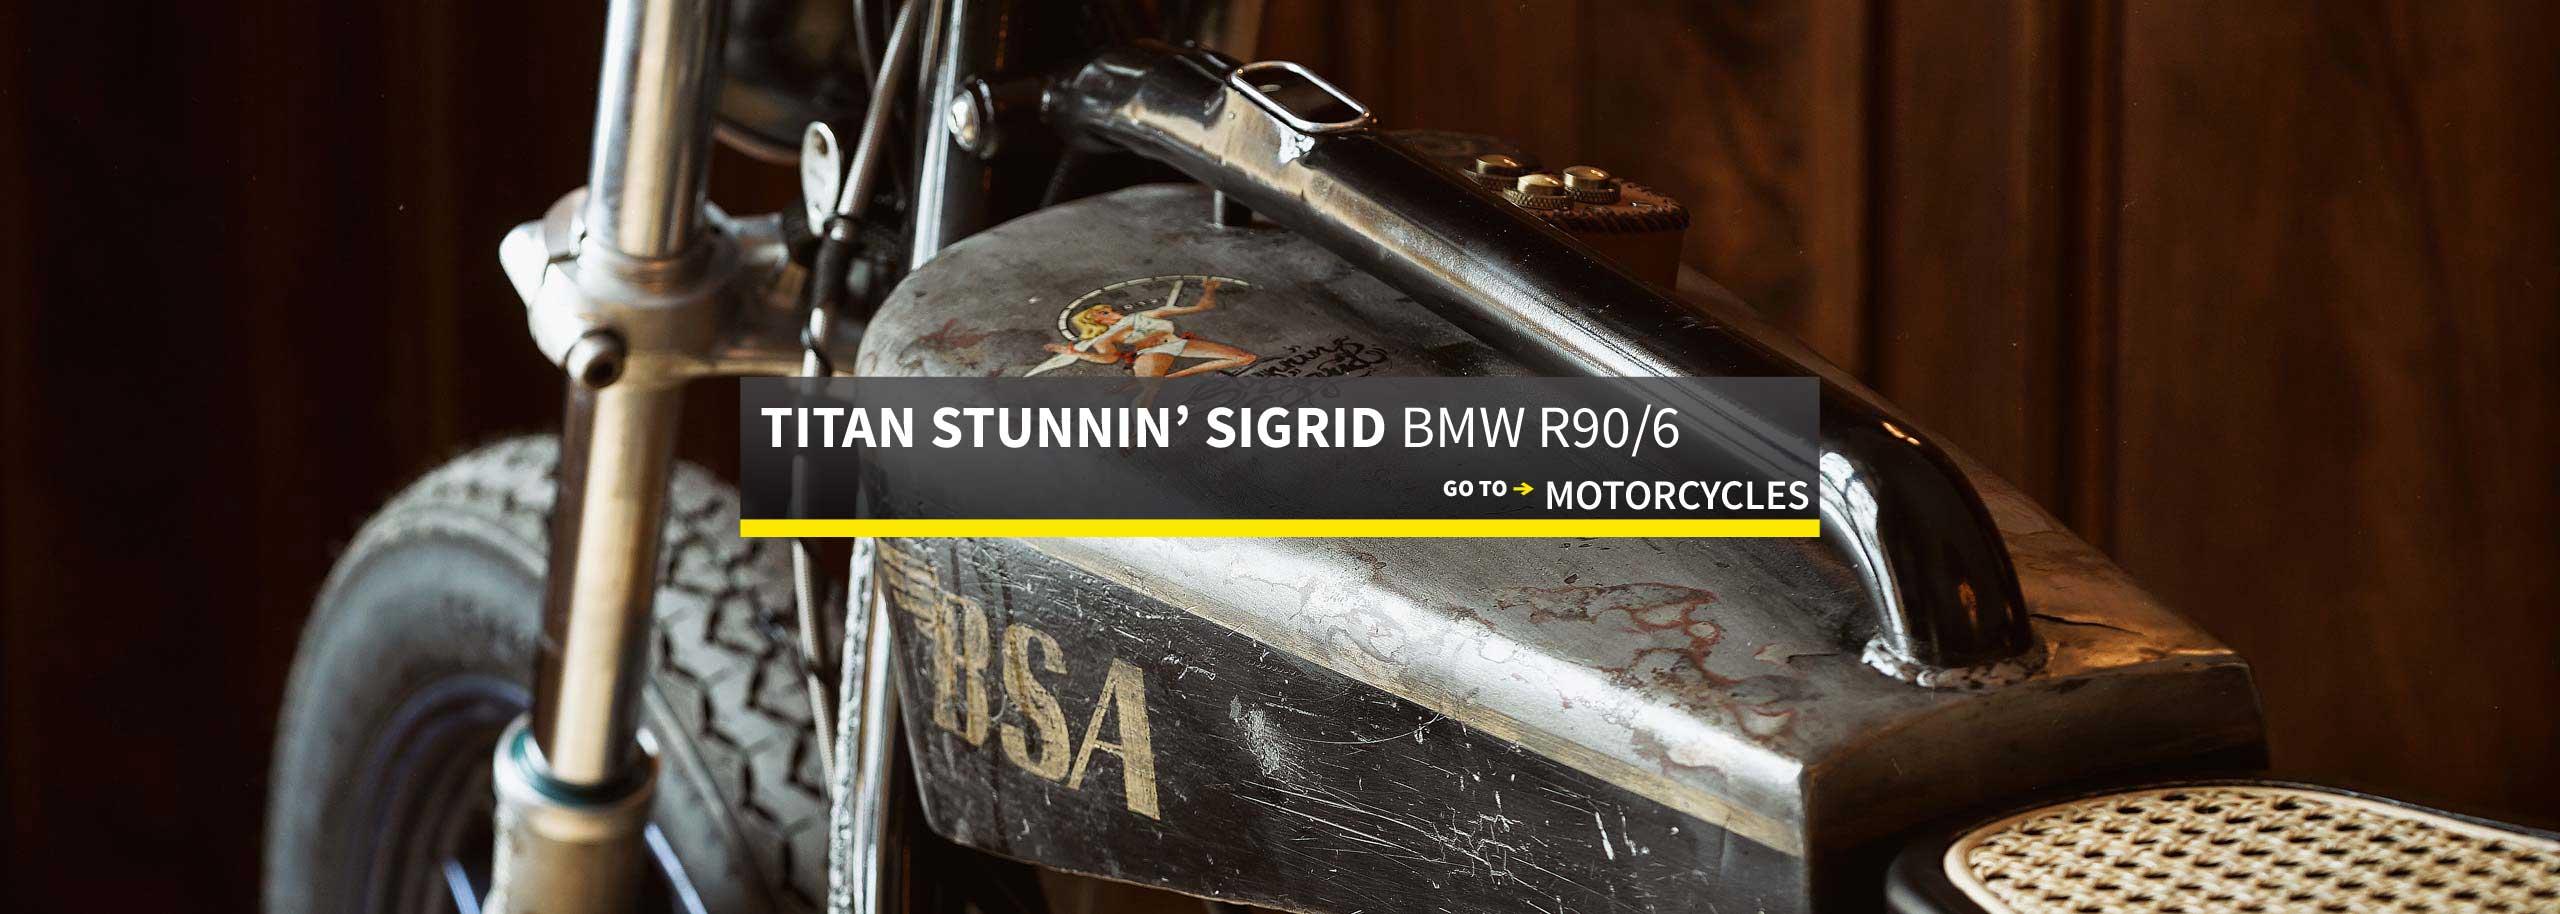 01_TitanMotorcycles_TITAN-Stunnin'Sigrid-BMWR90-6-CafeRacer-CustomBike-Graz-Austria_Motorrad-Werkstatt